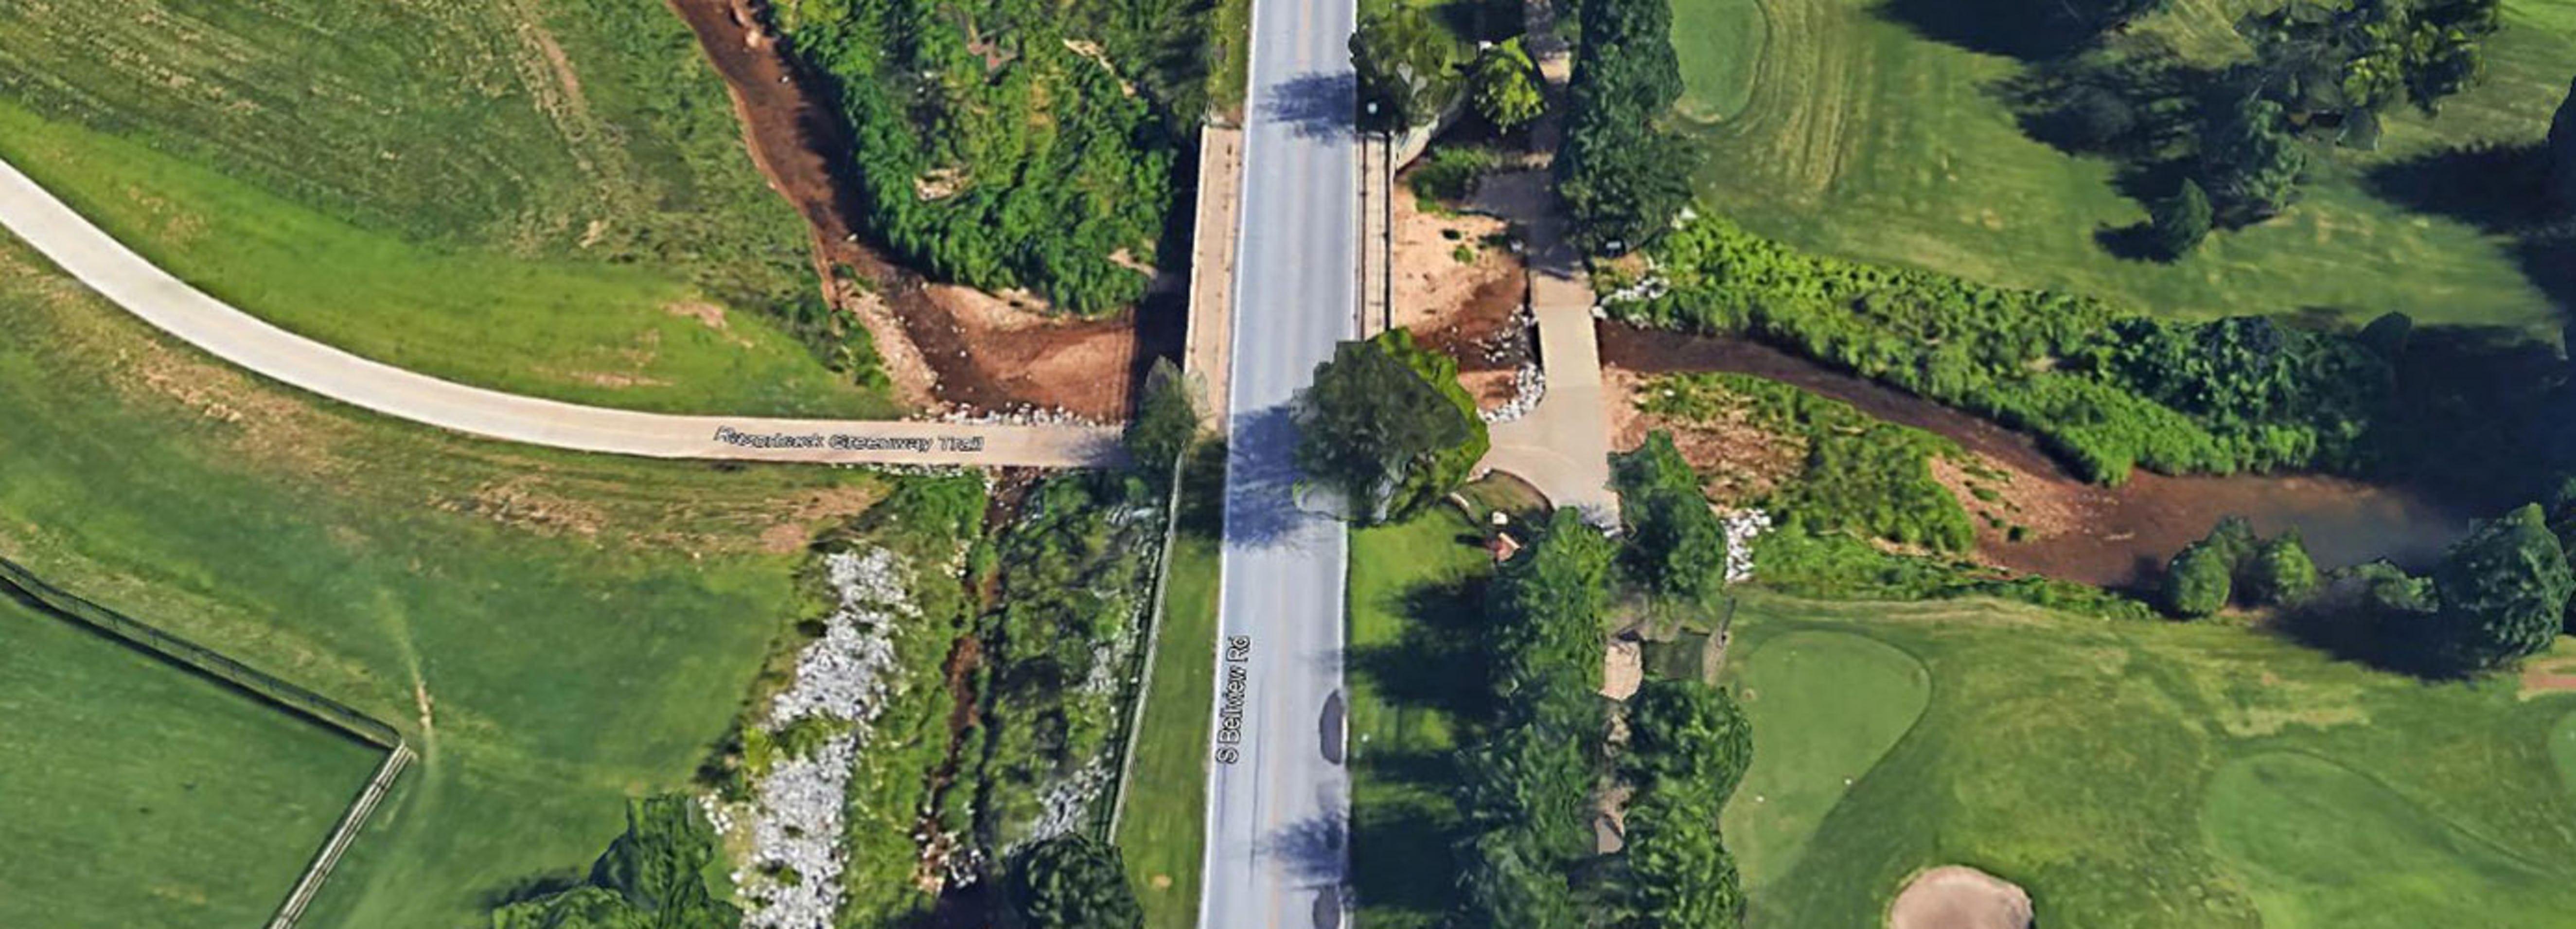 Case-215_Bellview-Bridge_Aerial_Edit.jpg